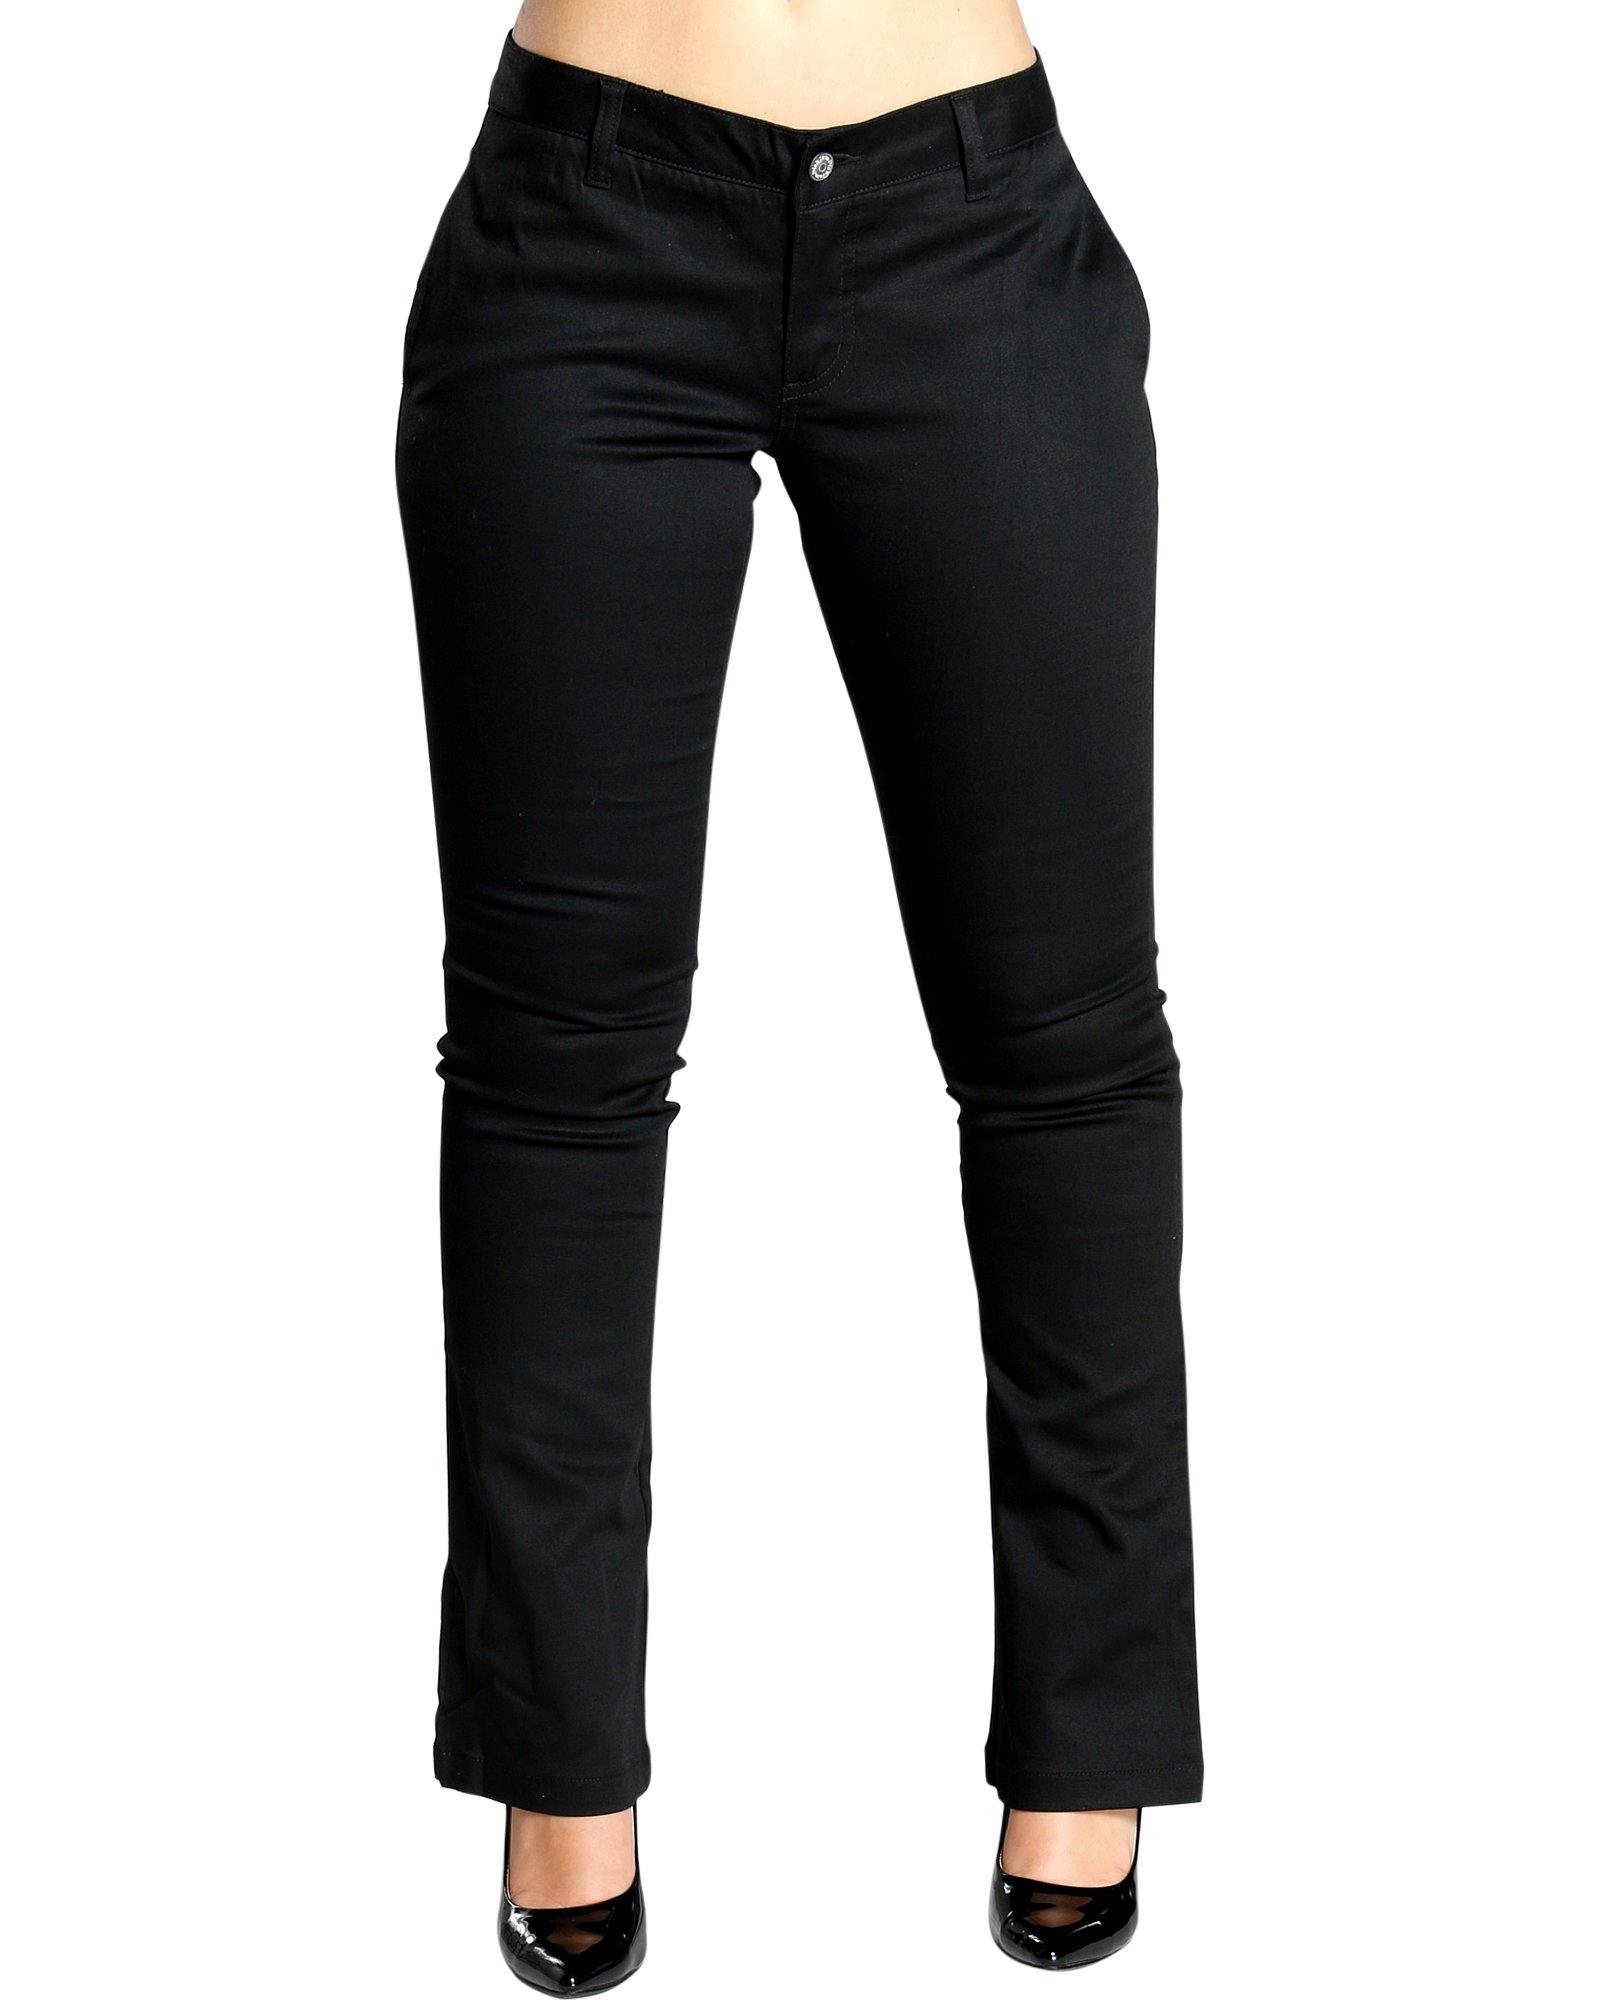 Dickies Girl Juniors 4 Pocket Straight Leg Pant,Black,7